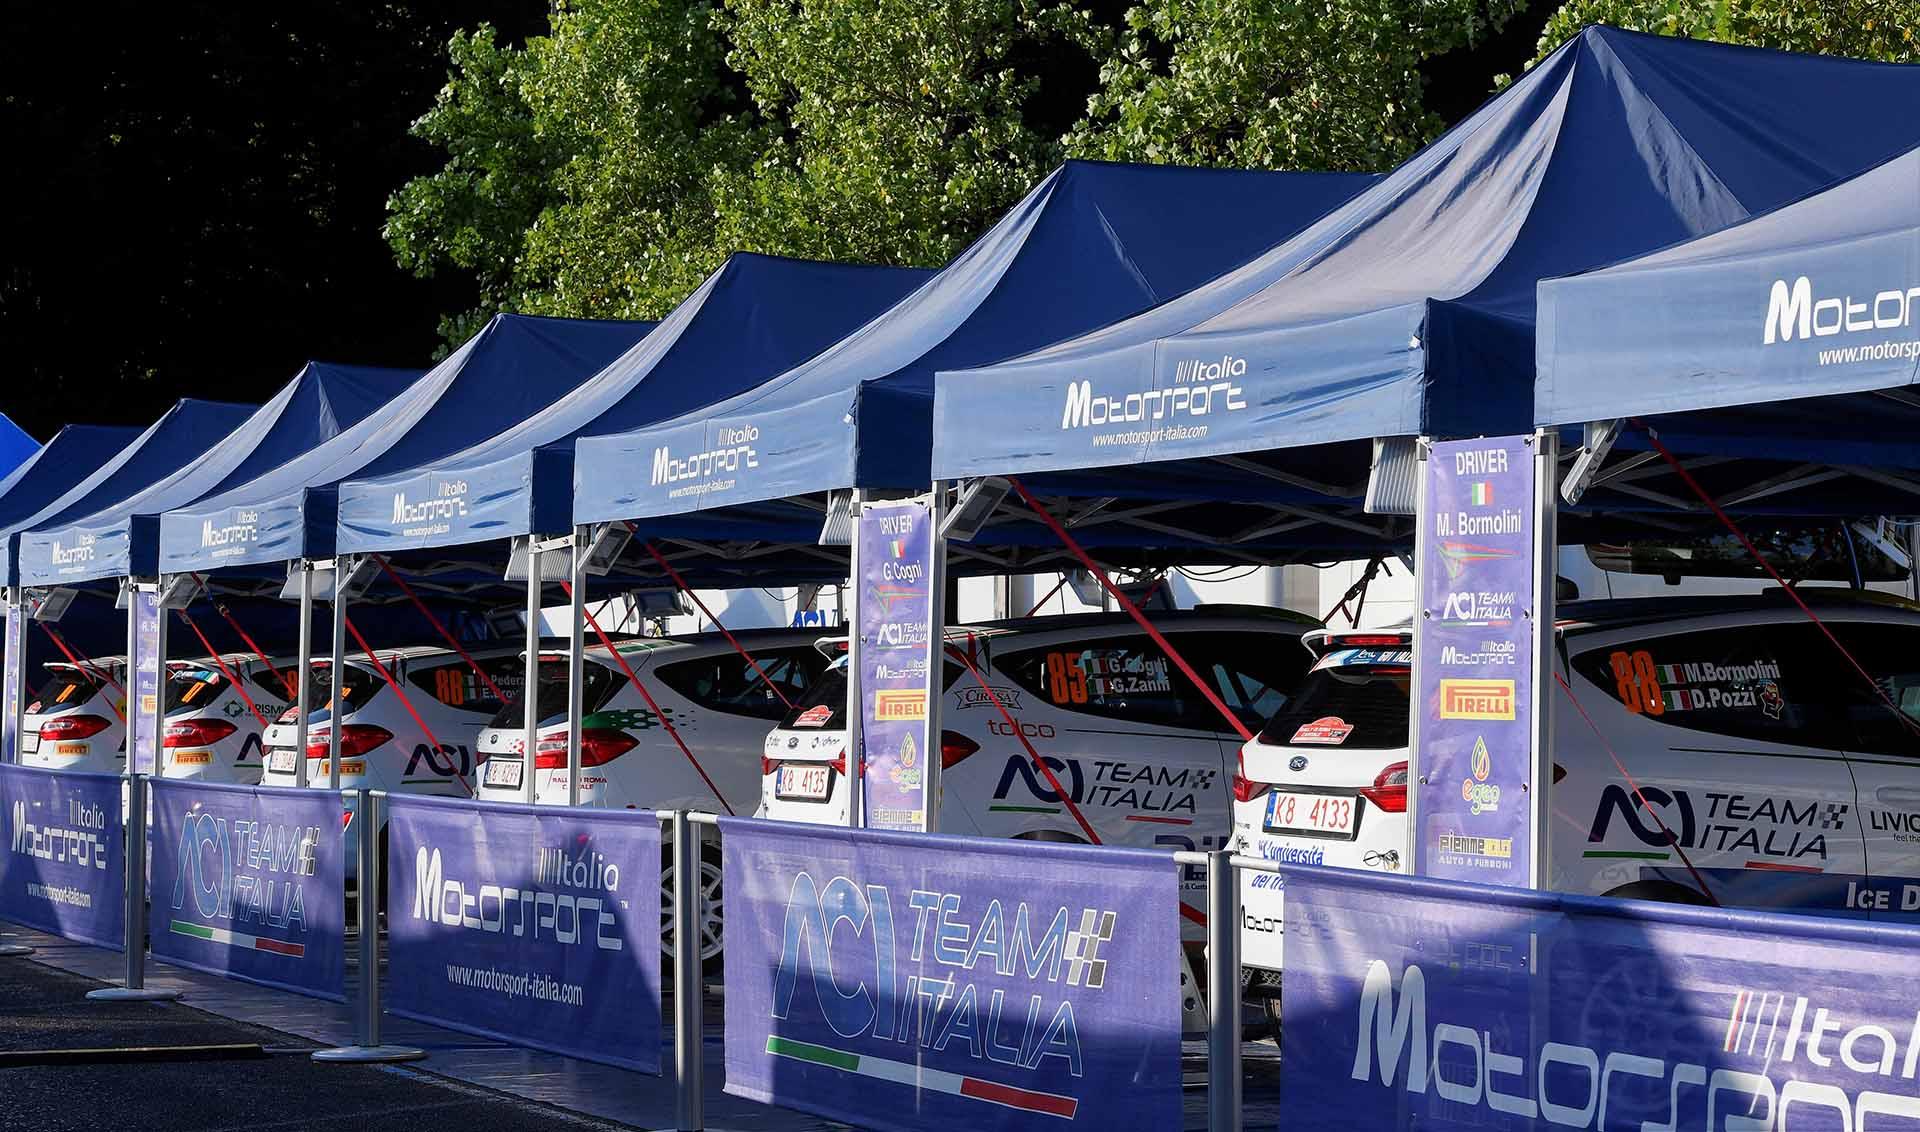 Mazzocchi-Gallotti win on the ground of the 48th San Marino Rally